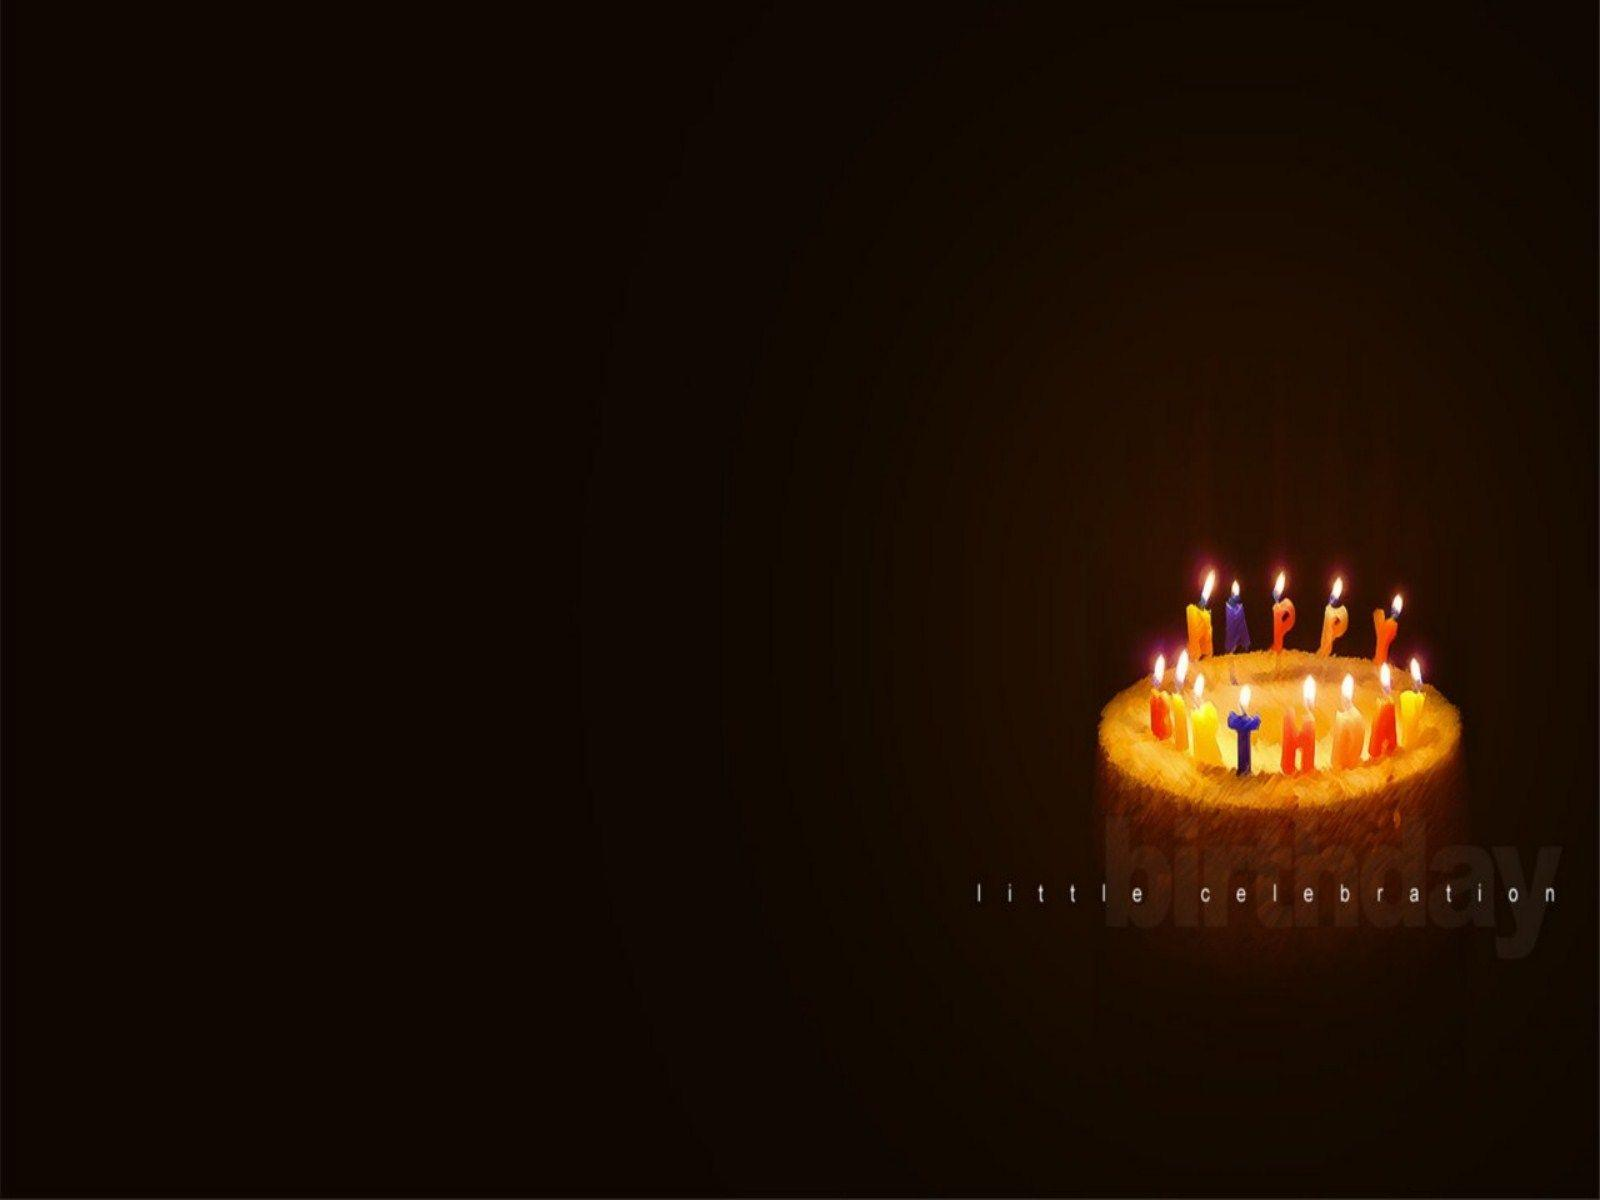 Cute Baby Boy Full Hd Wallpaper Happy Birthday Cake Pictures Pixelstalk Net